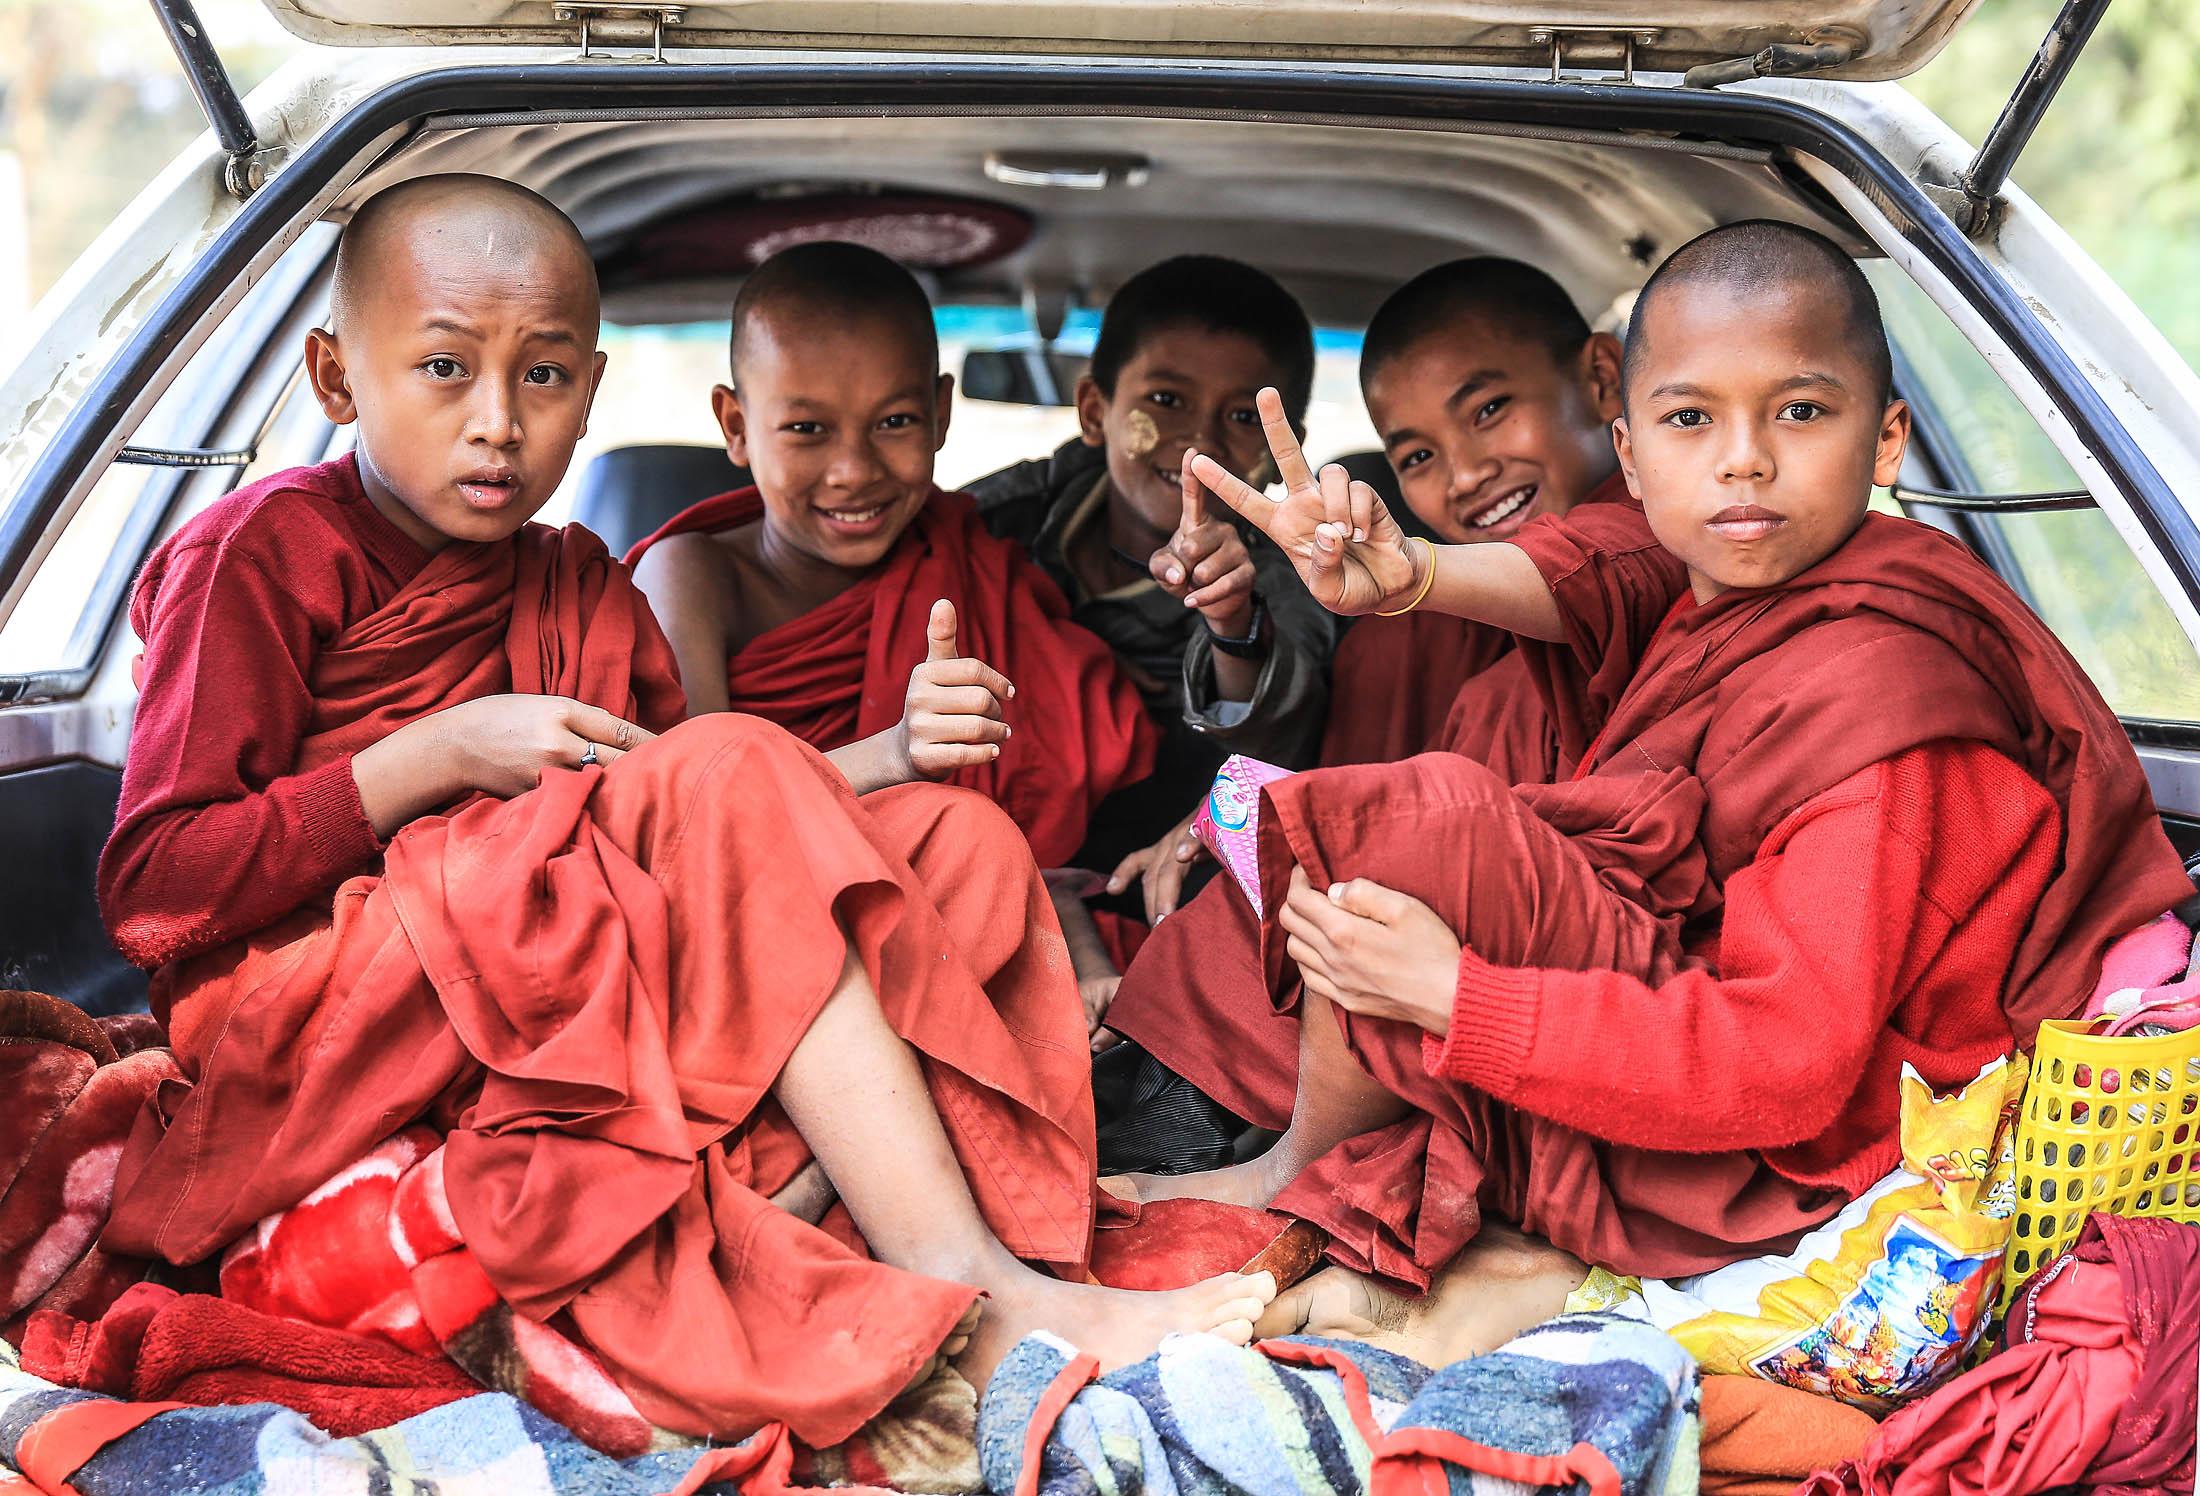 Young monks, Bagan, Myanmar